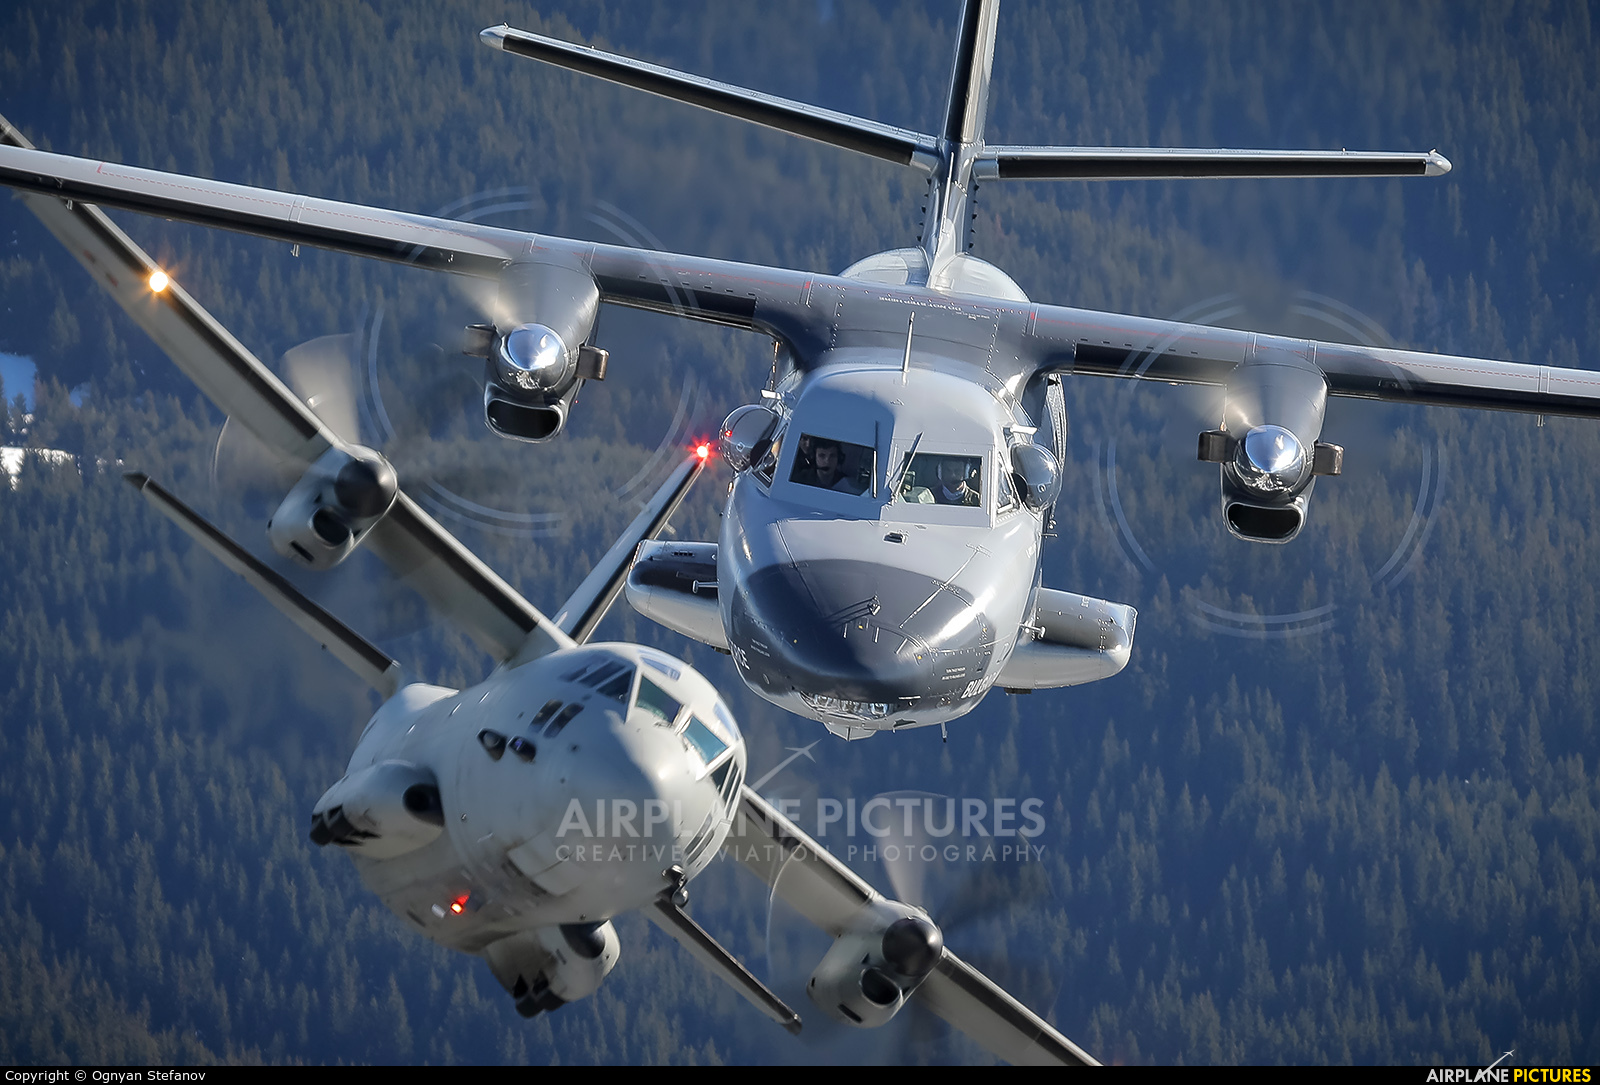 Bulgaria - Air Force 069 aircraft at In Flight - Bulgaria